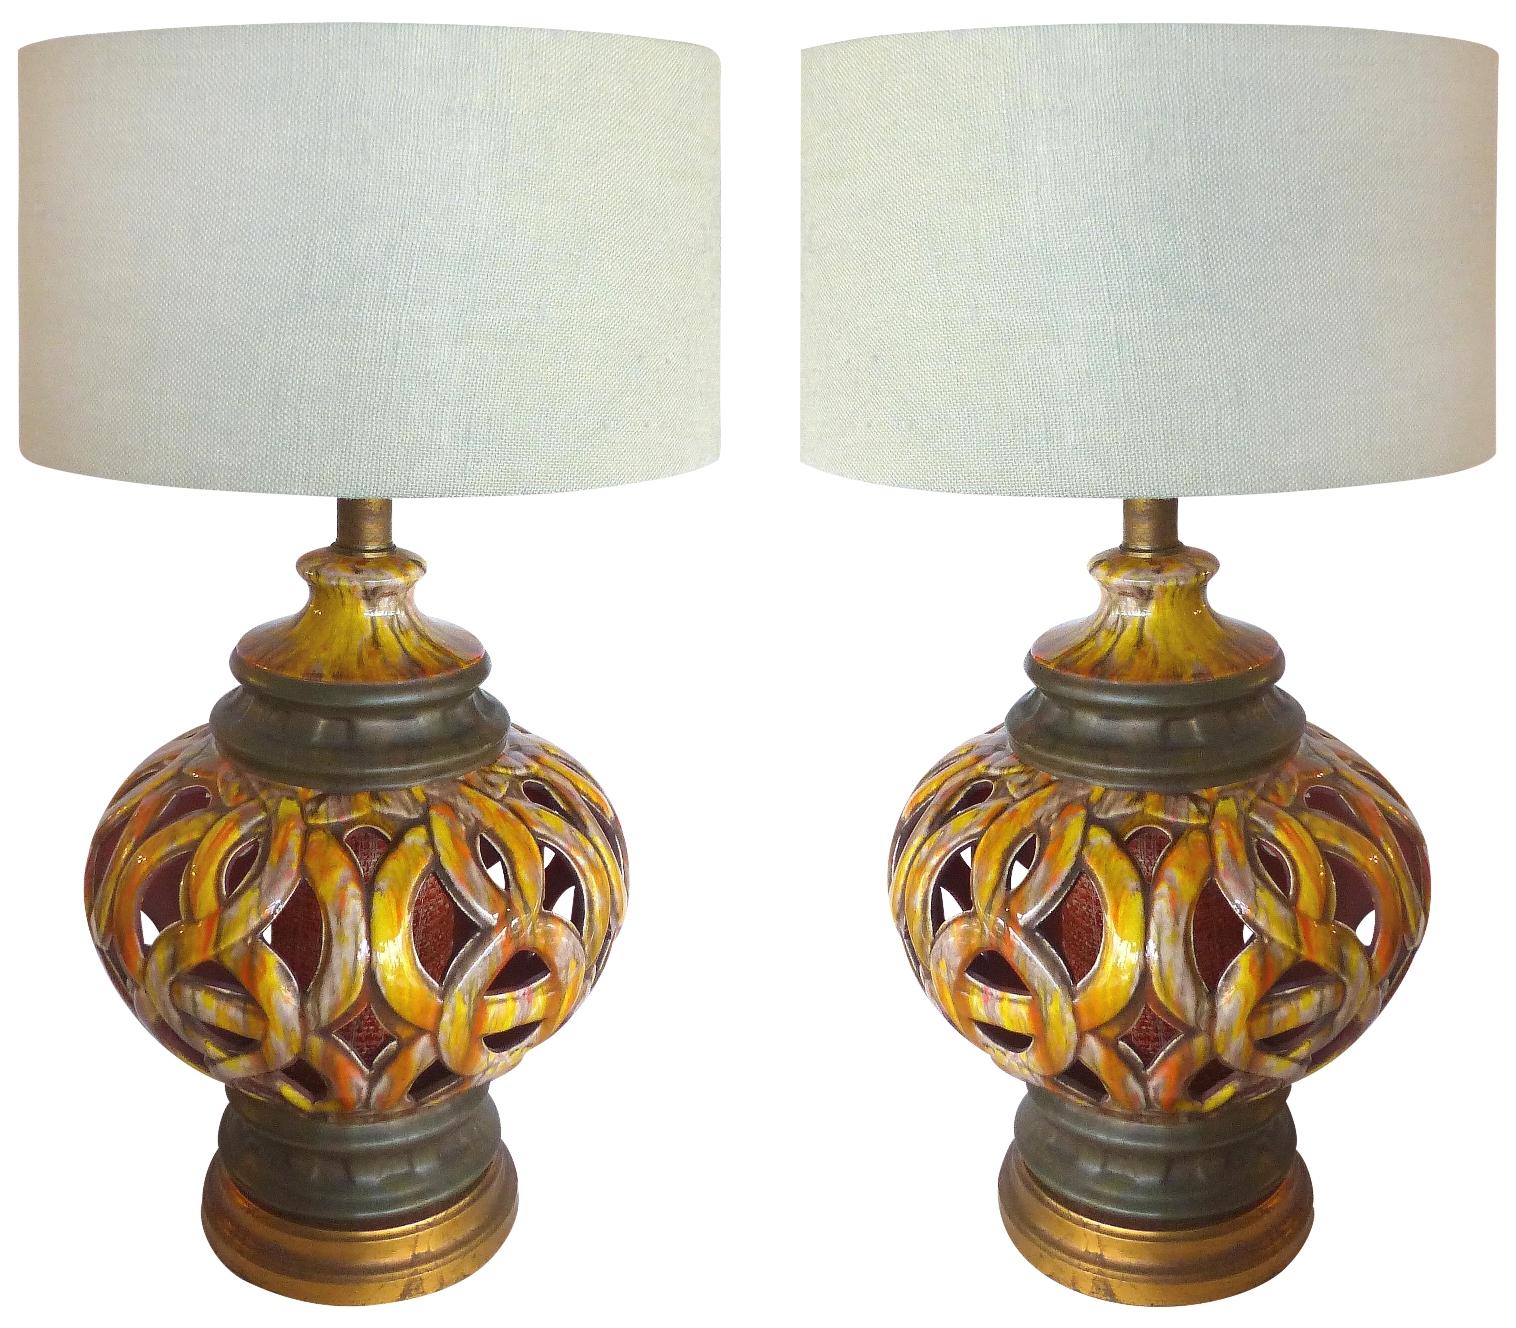 60s Pierced Ceramic Table Lamps Pair Modernism